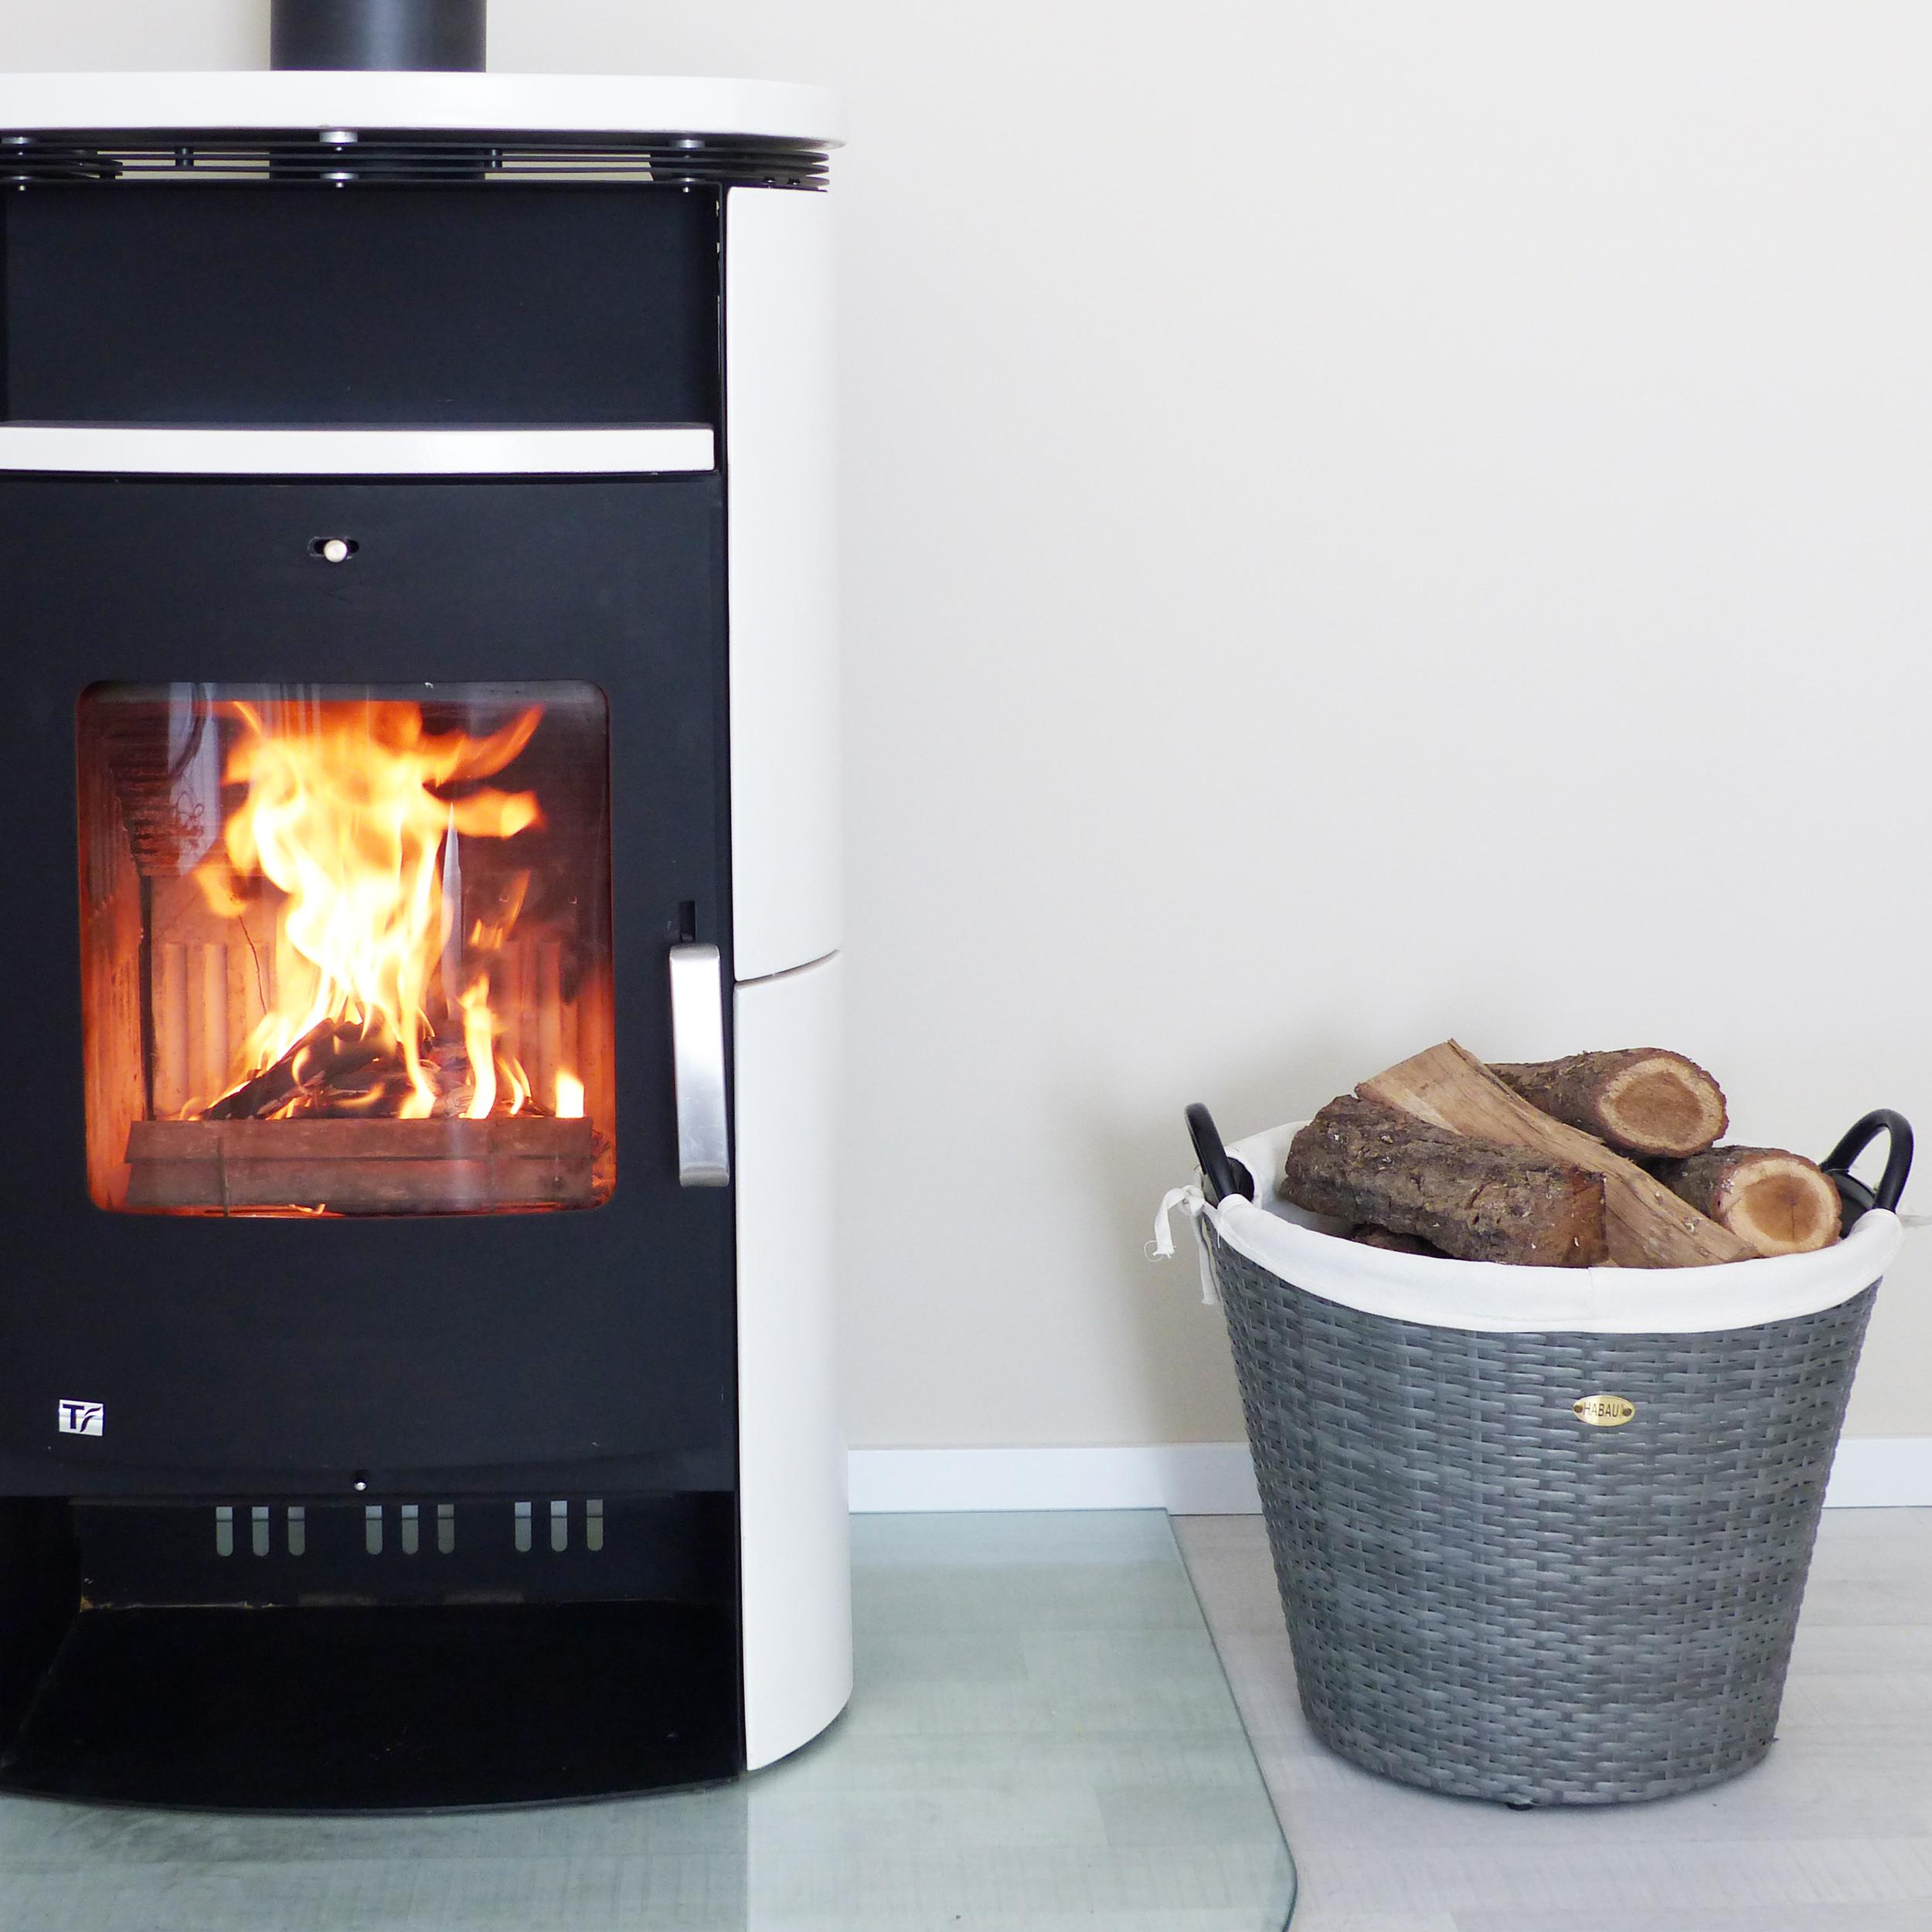 HABAU Feuerholzkorb aus Polyethylen - Anwendungsbeispiel - 2725